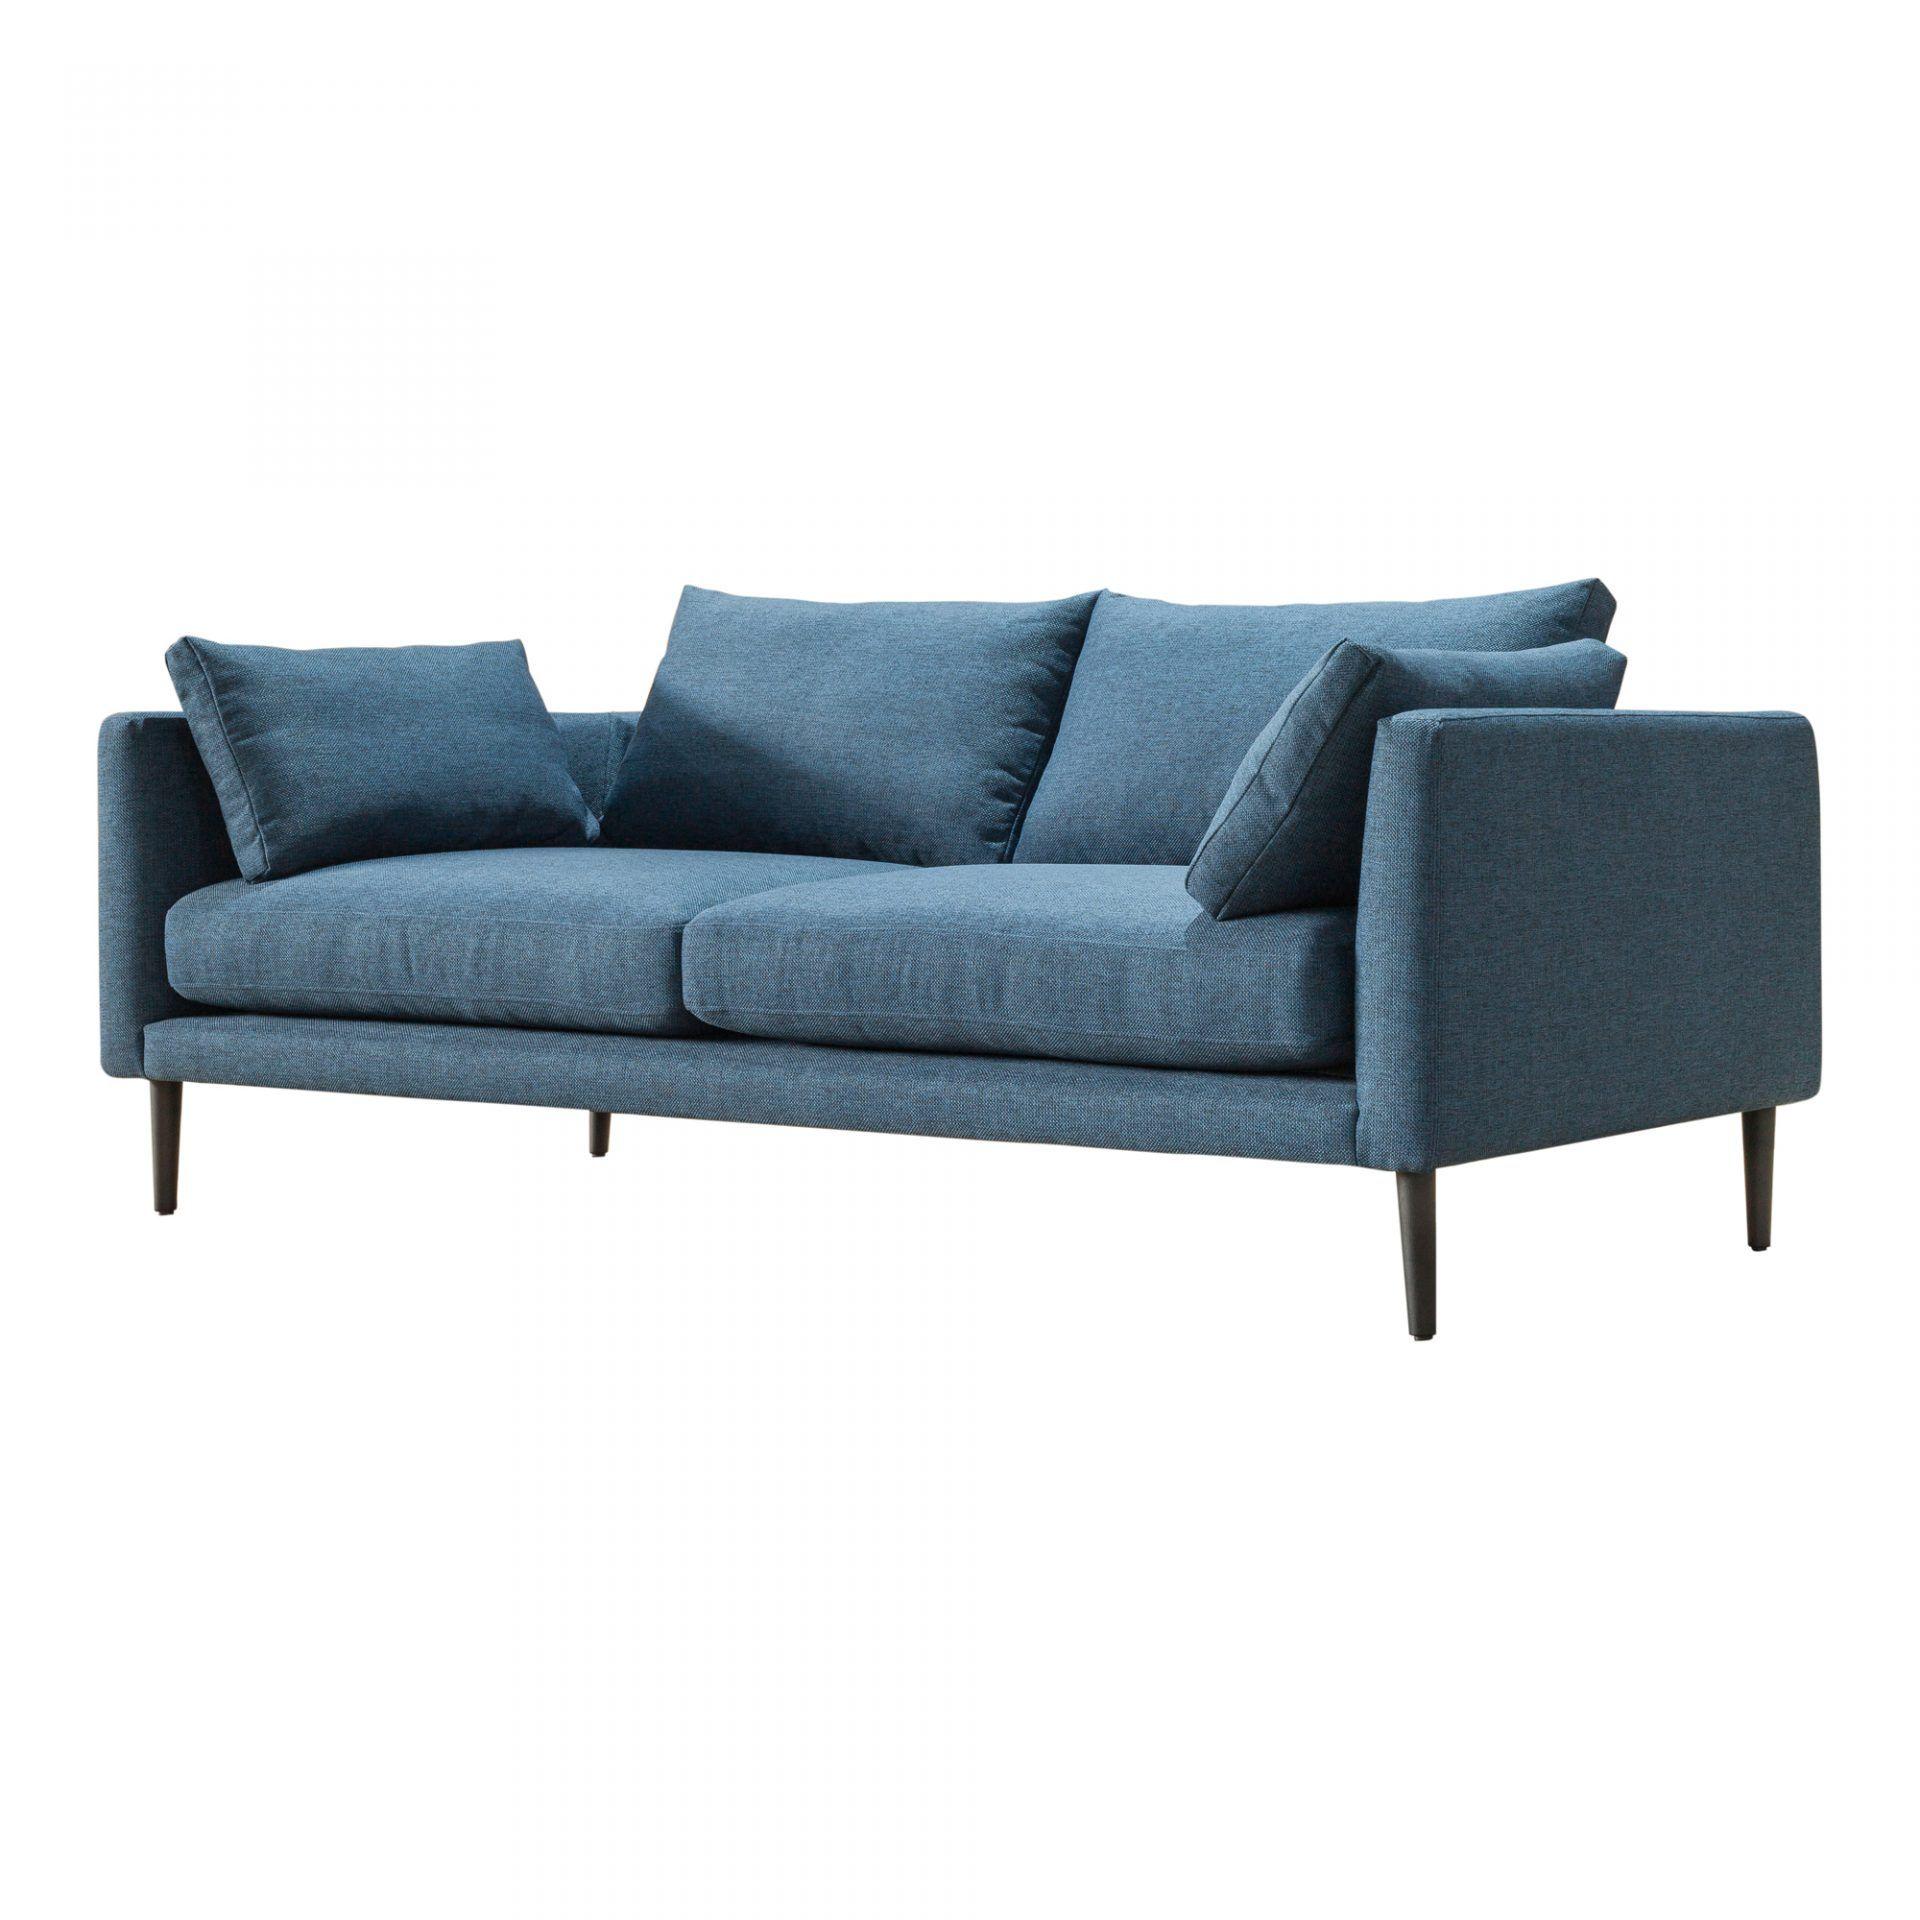 Willa Arlo Interiors Gilmore Twin Daybed Upholstered Sofa Sofa Furniture